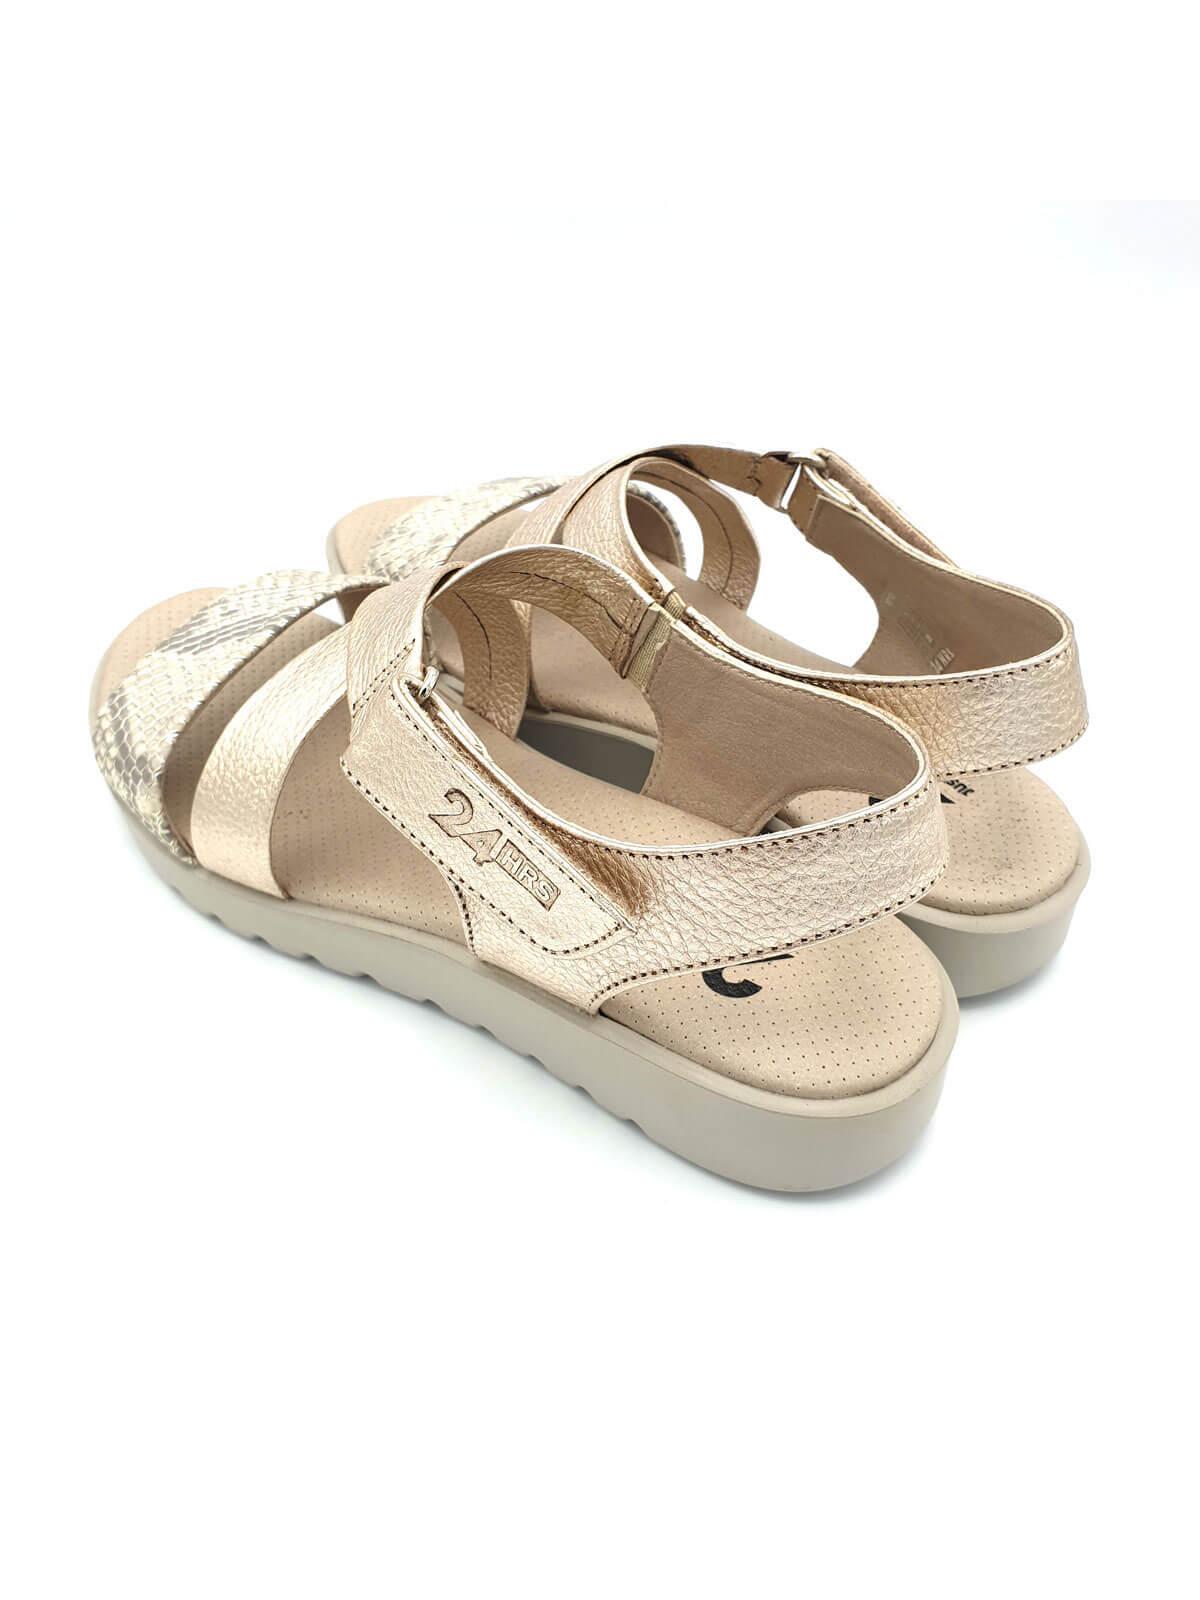 Moda Planas Zapatos Doradas De MujerBanes Sandalias 24hrs nZwO08kXNP